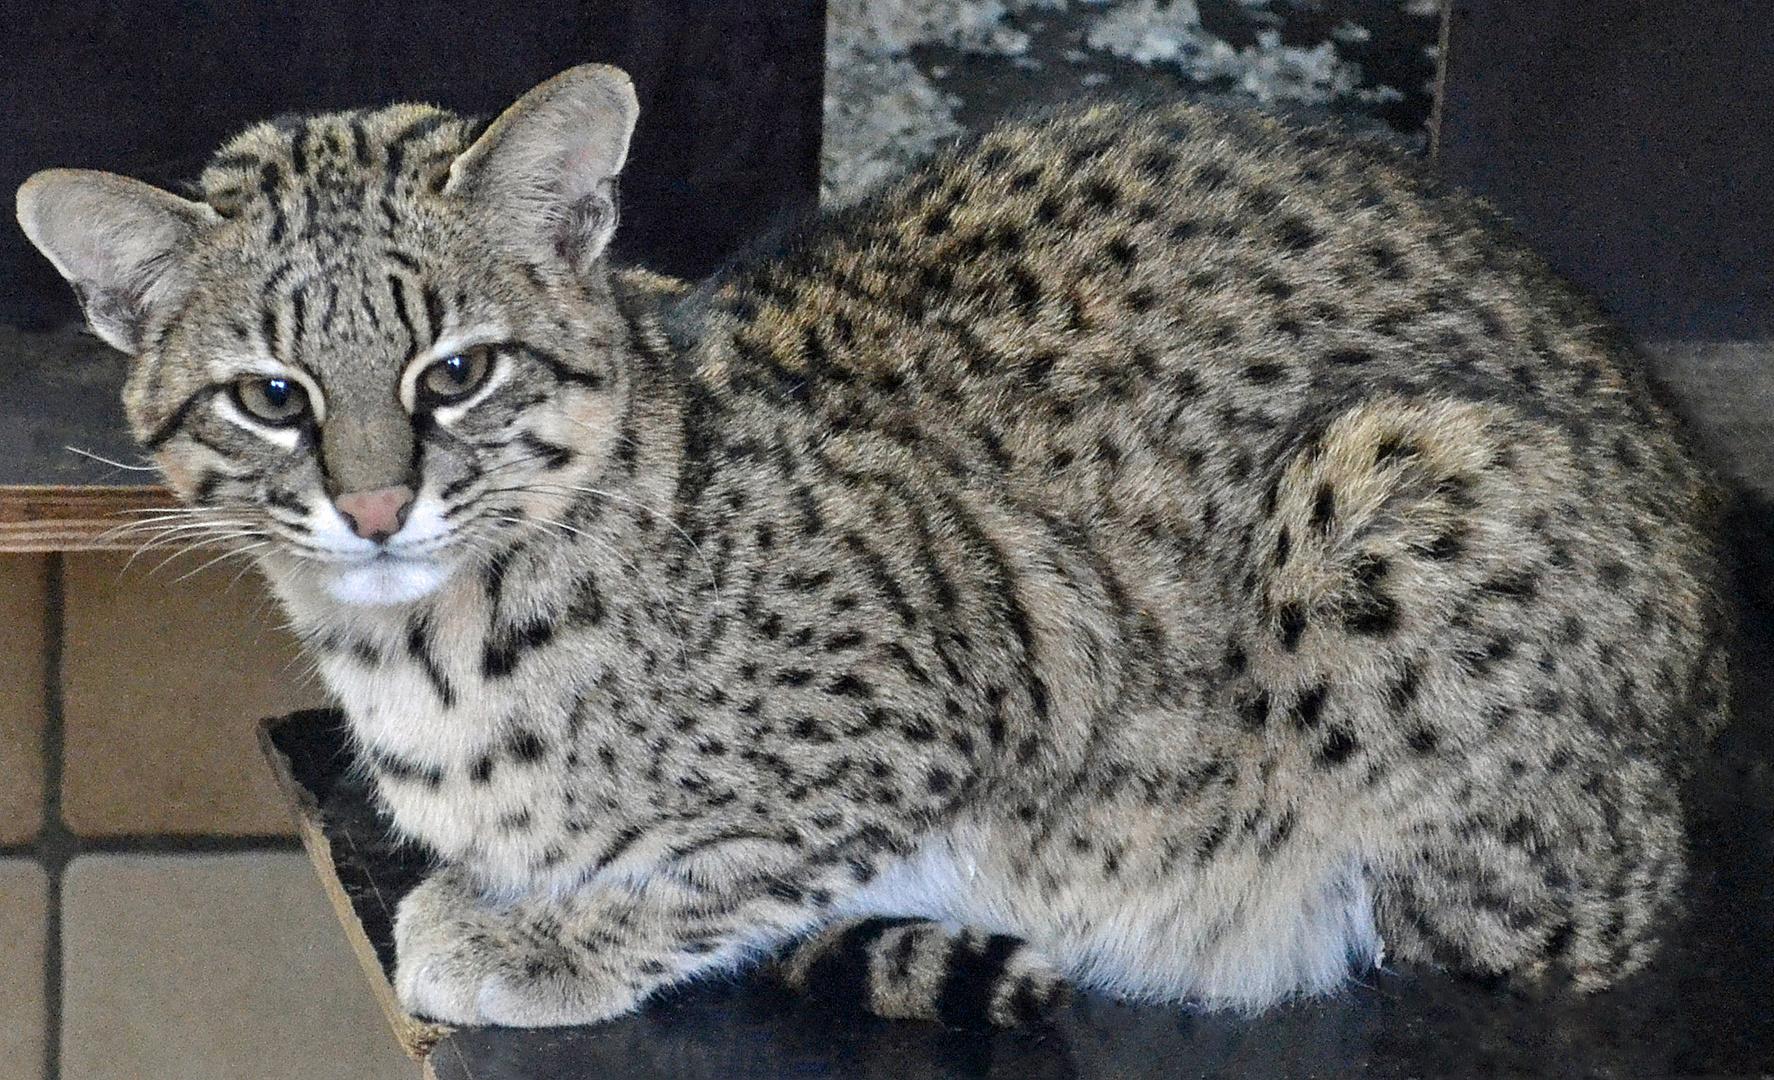 salzkatze im opelzoo kronberg foto & bild | tiere, zoo, wildpark